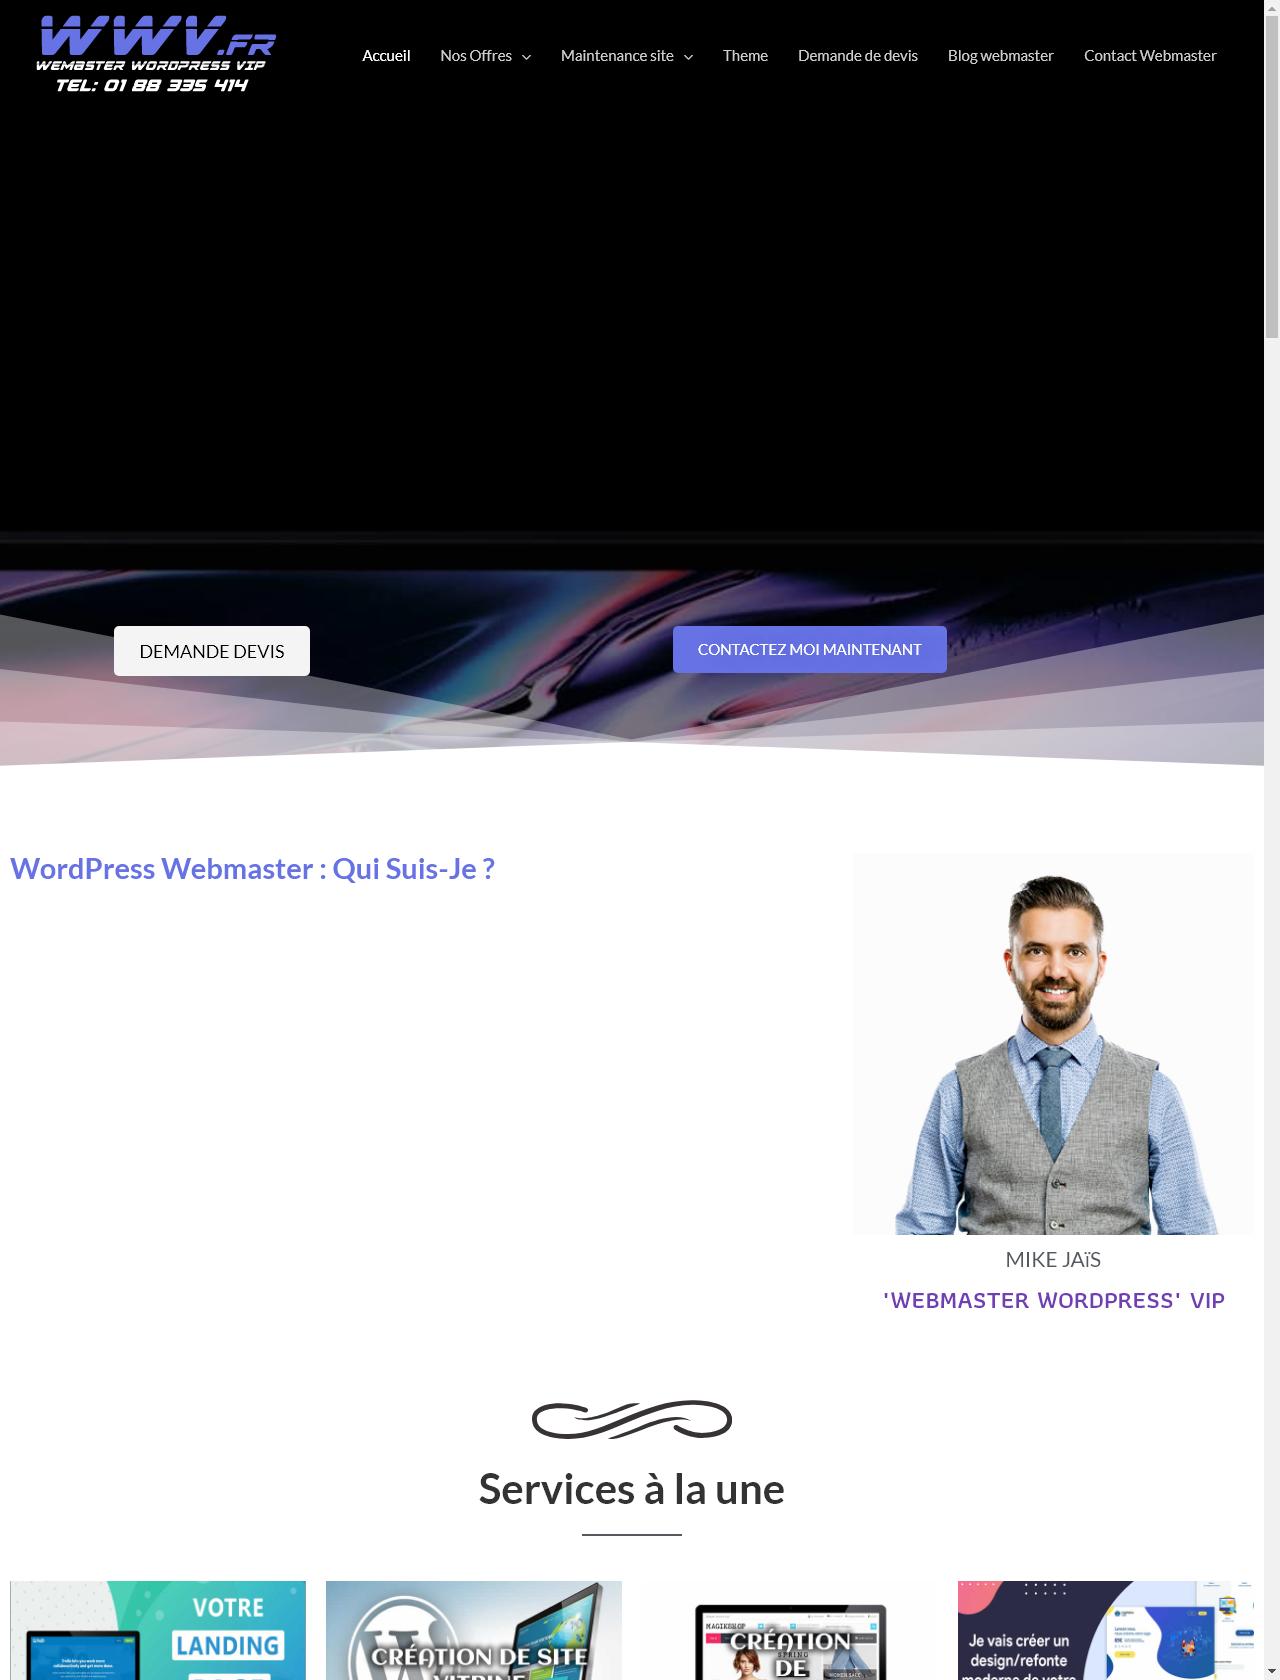 Screenshot Desktop - https://www.webmaster-wordpress.fr/